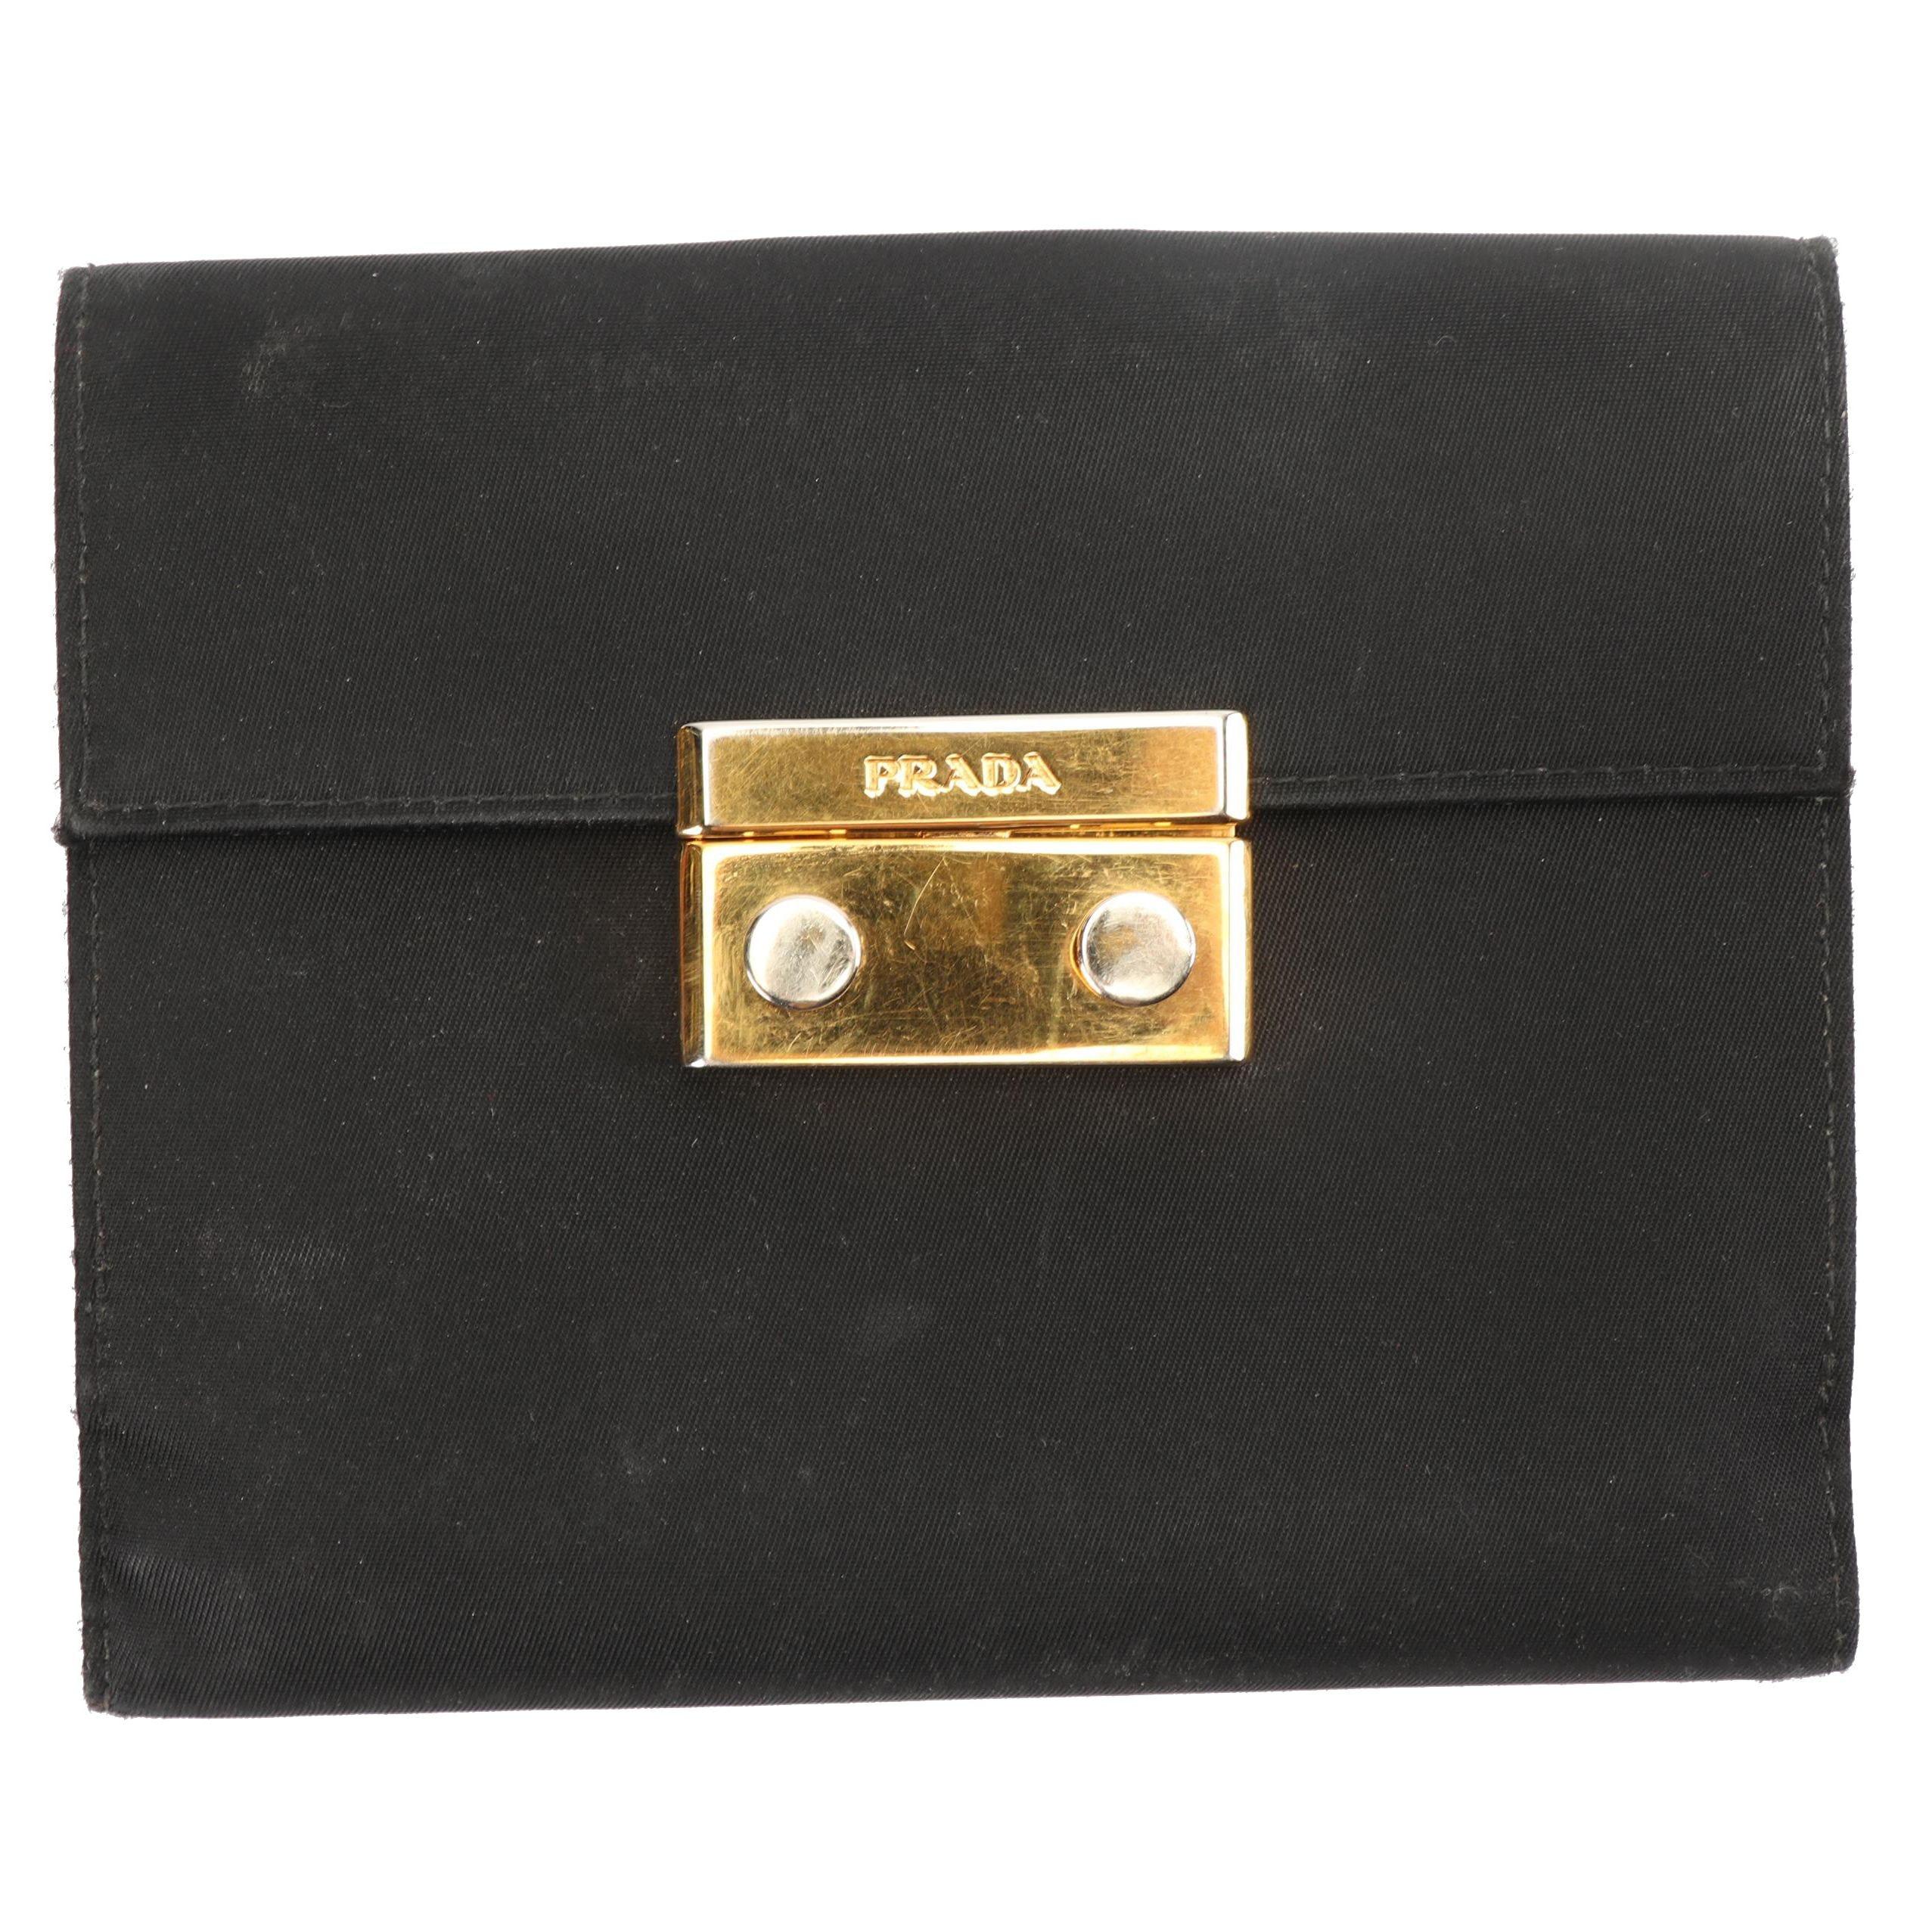 Prada Black Nylon and Saffiano Leather Bifold Wallet